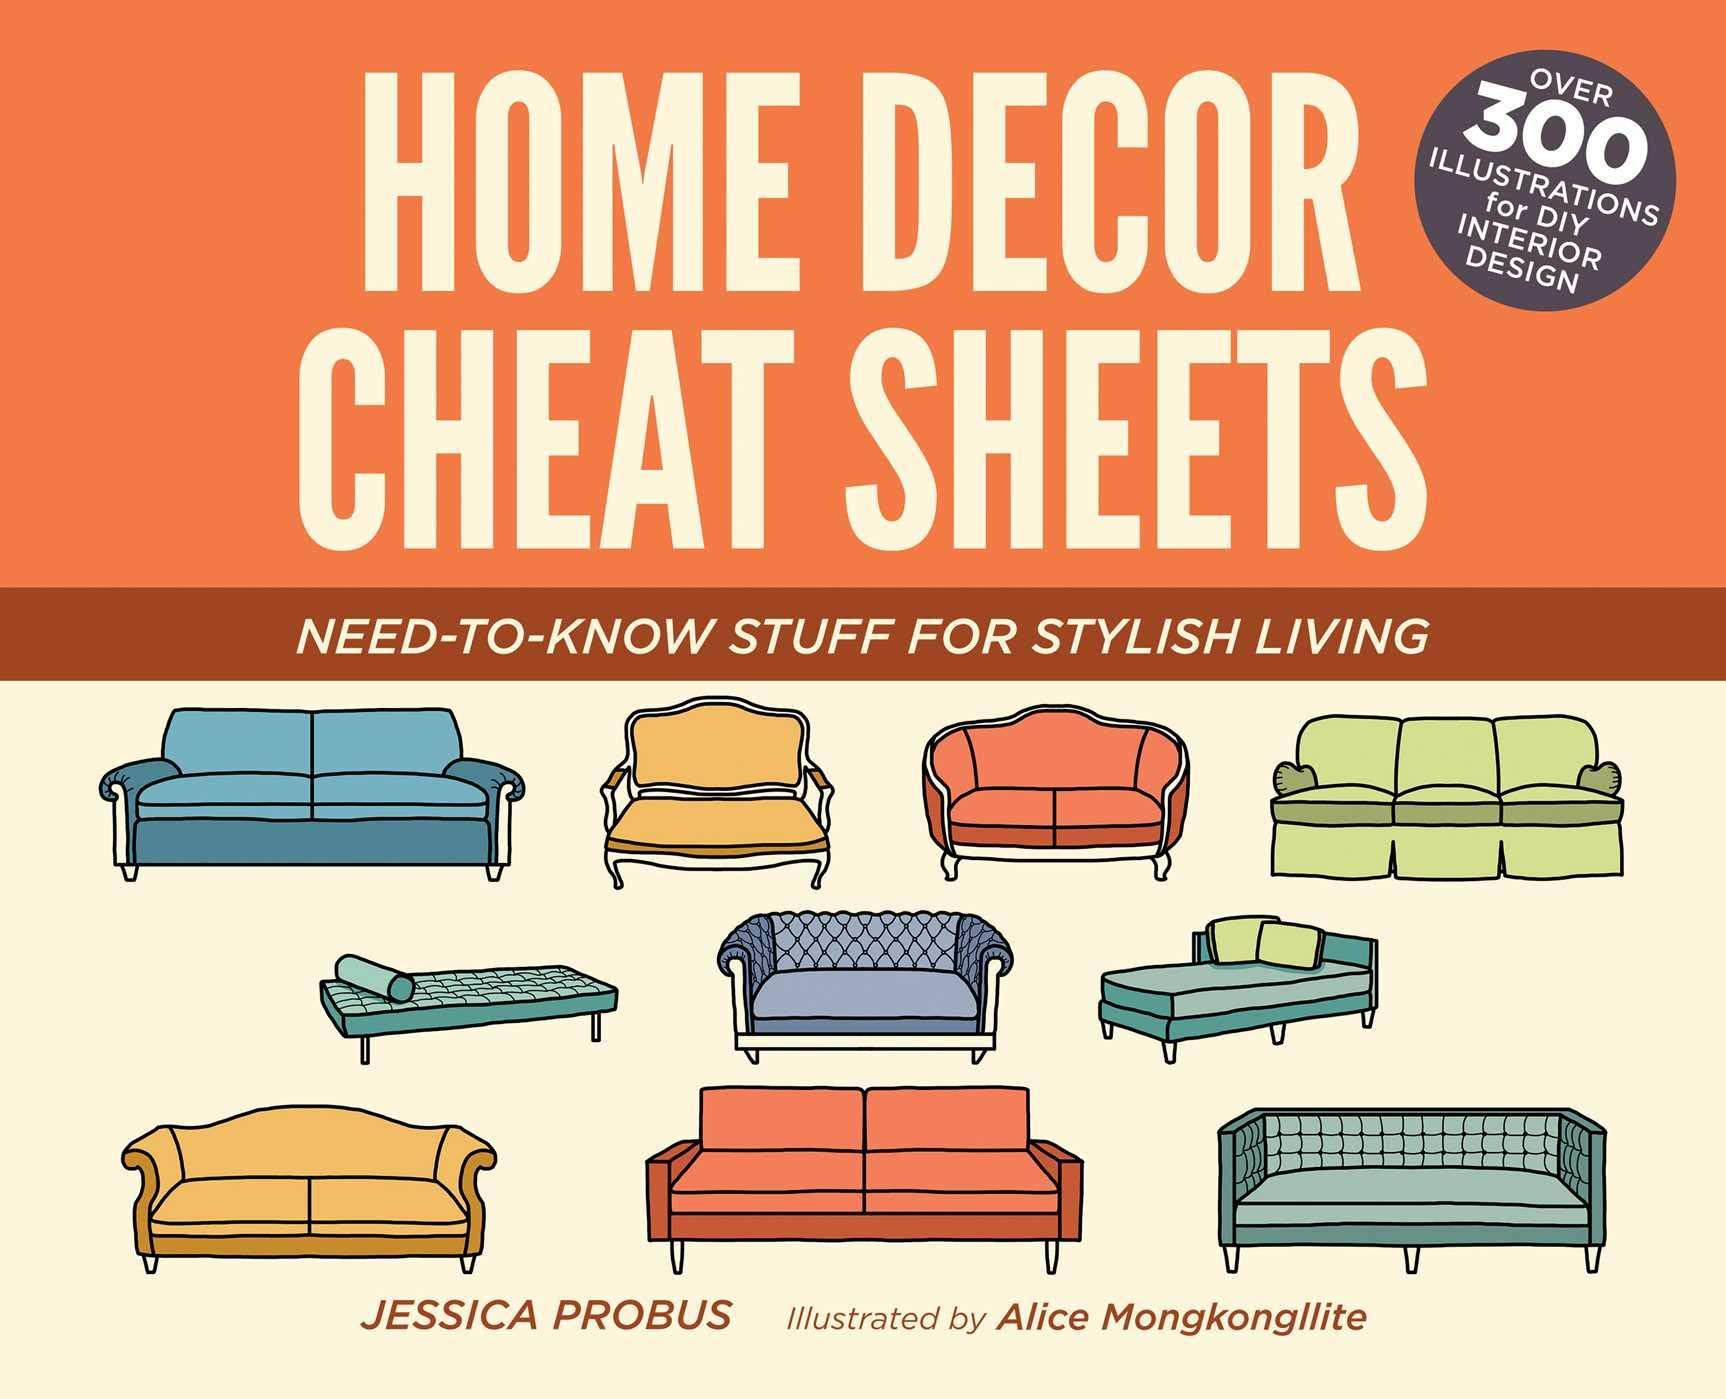 Home Decor Cheat Sheets Need To Know Stuff For Stylish Living Probus Jessica Mongkongllite Alice 9781612435541 Amazon Com Books